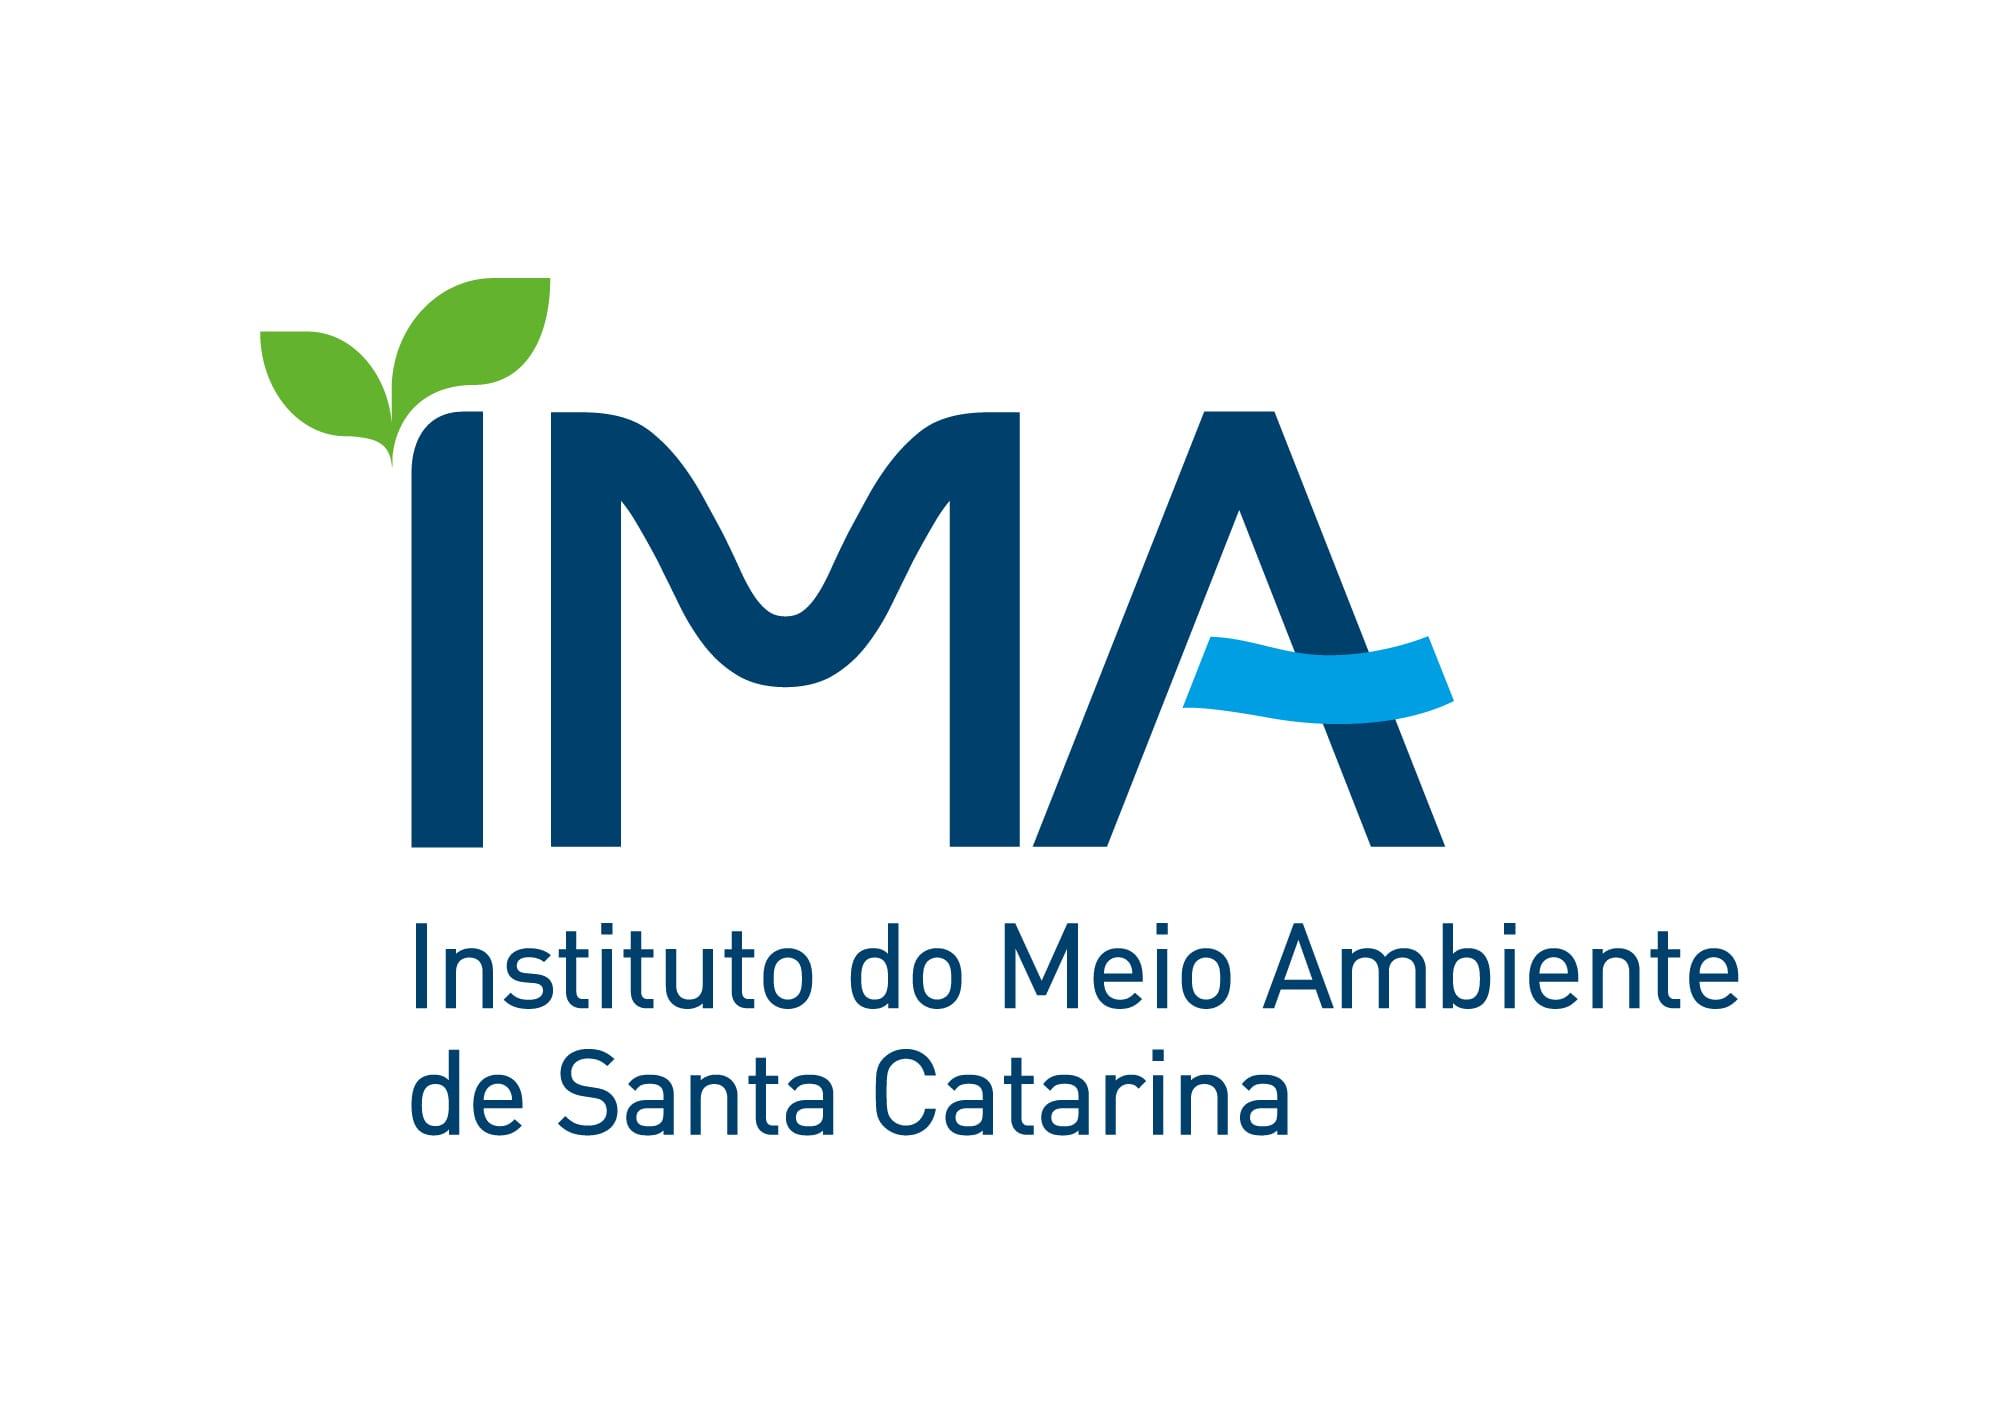 ima-sc-logo.jpg